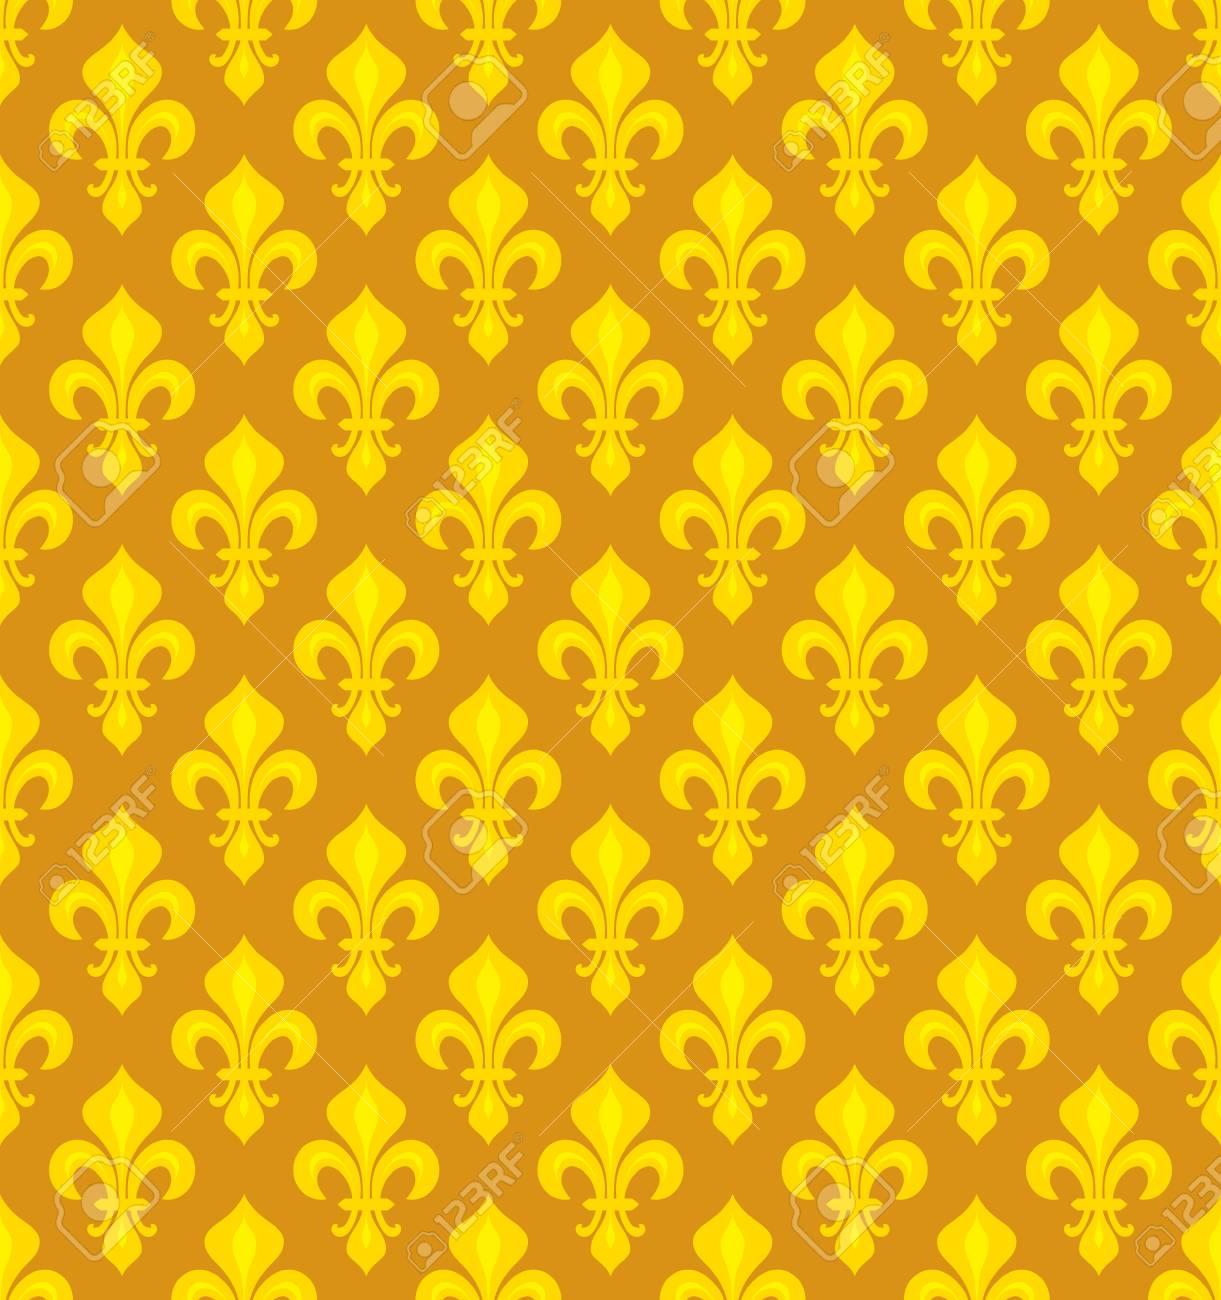 Royal Heraldic Lilies Fleur De Lis â Goldish Seamless Pattern Wallpaper Background